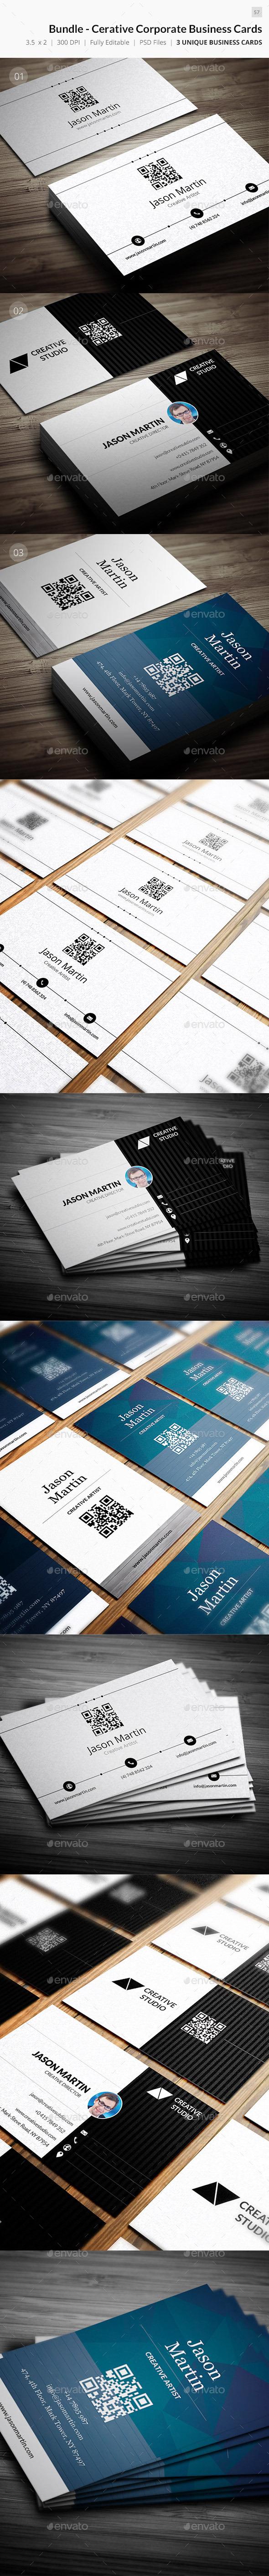 Bundle - Coroporate Business Cards - 57 - Corporate Business Cards